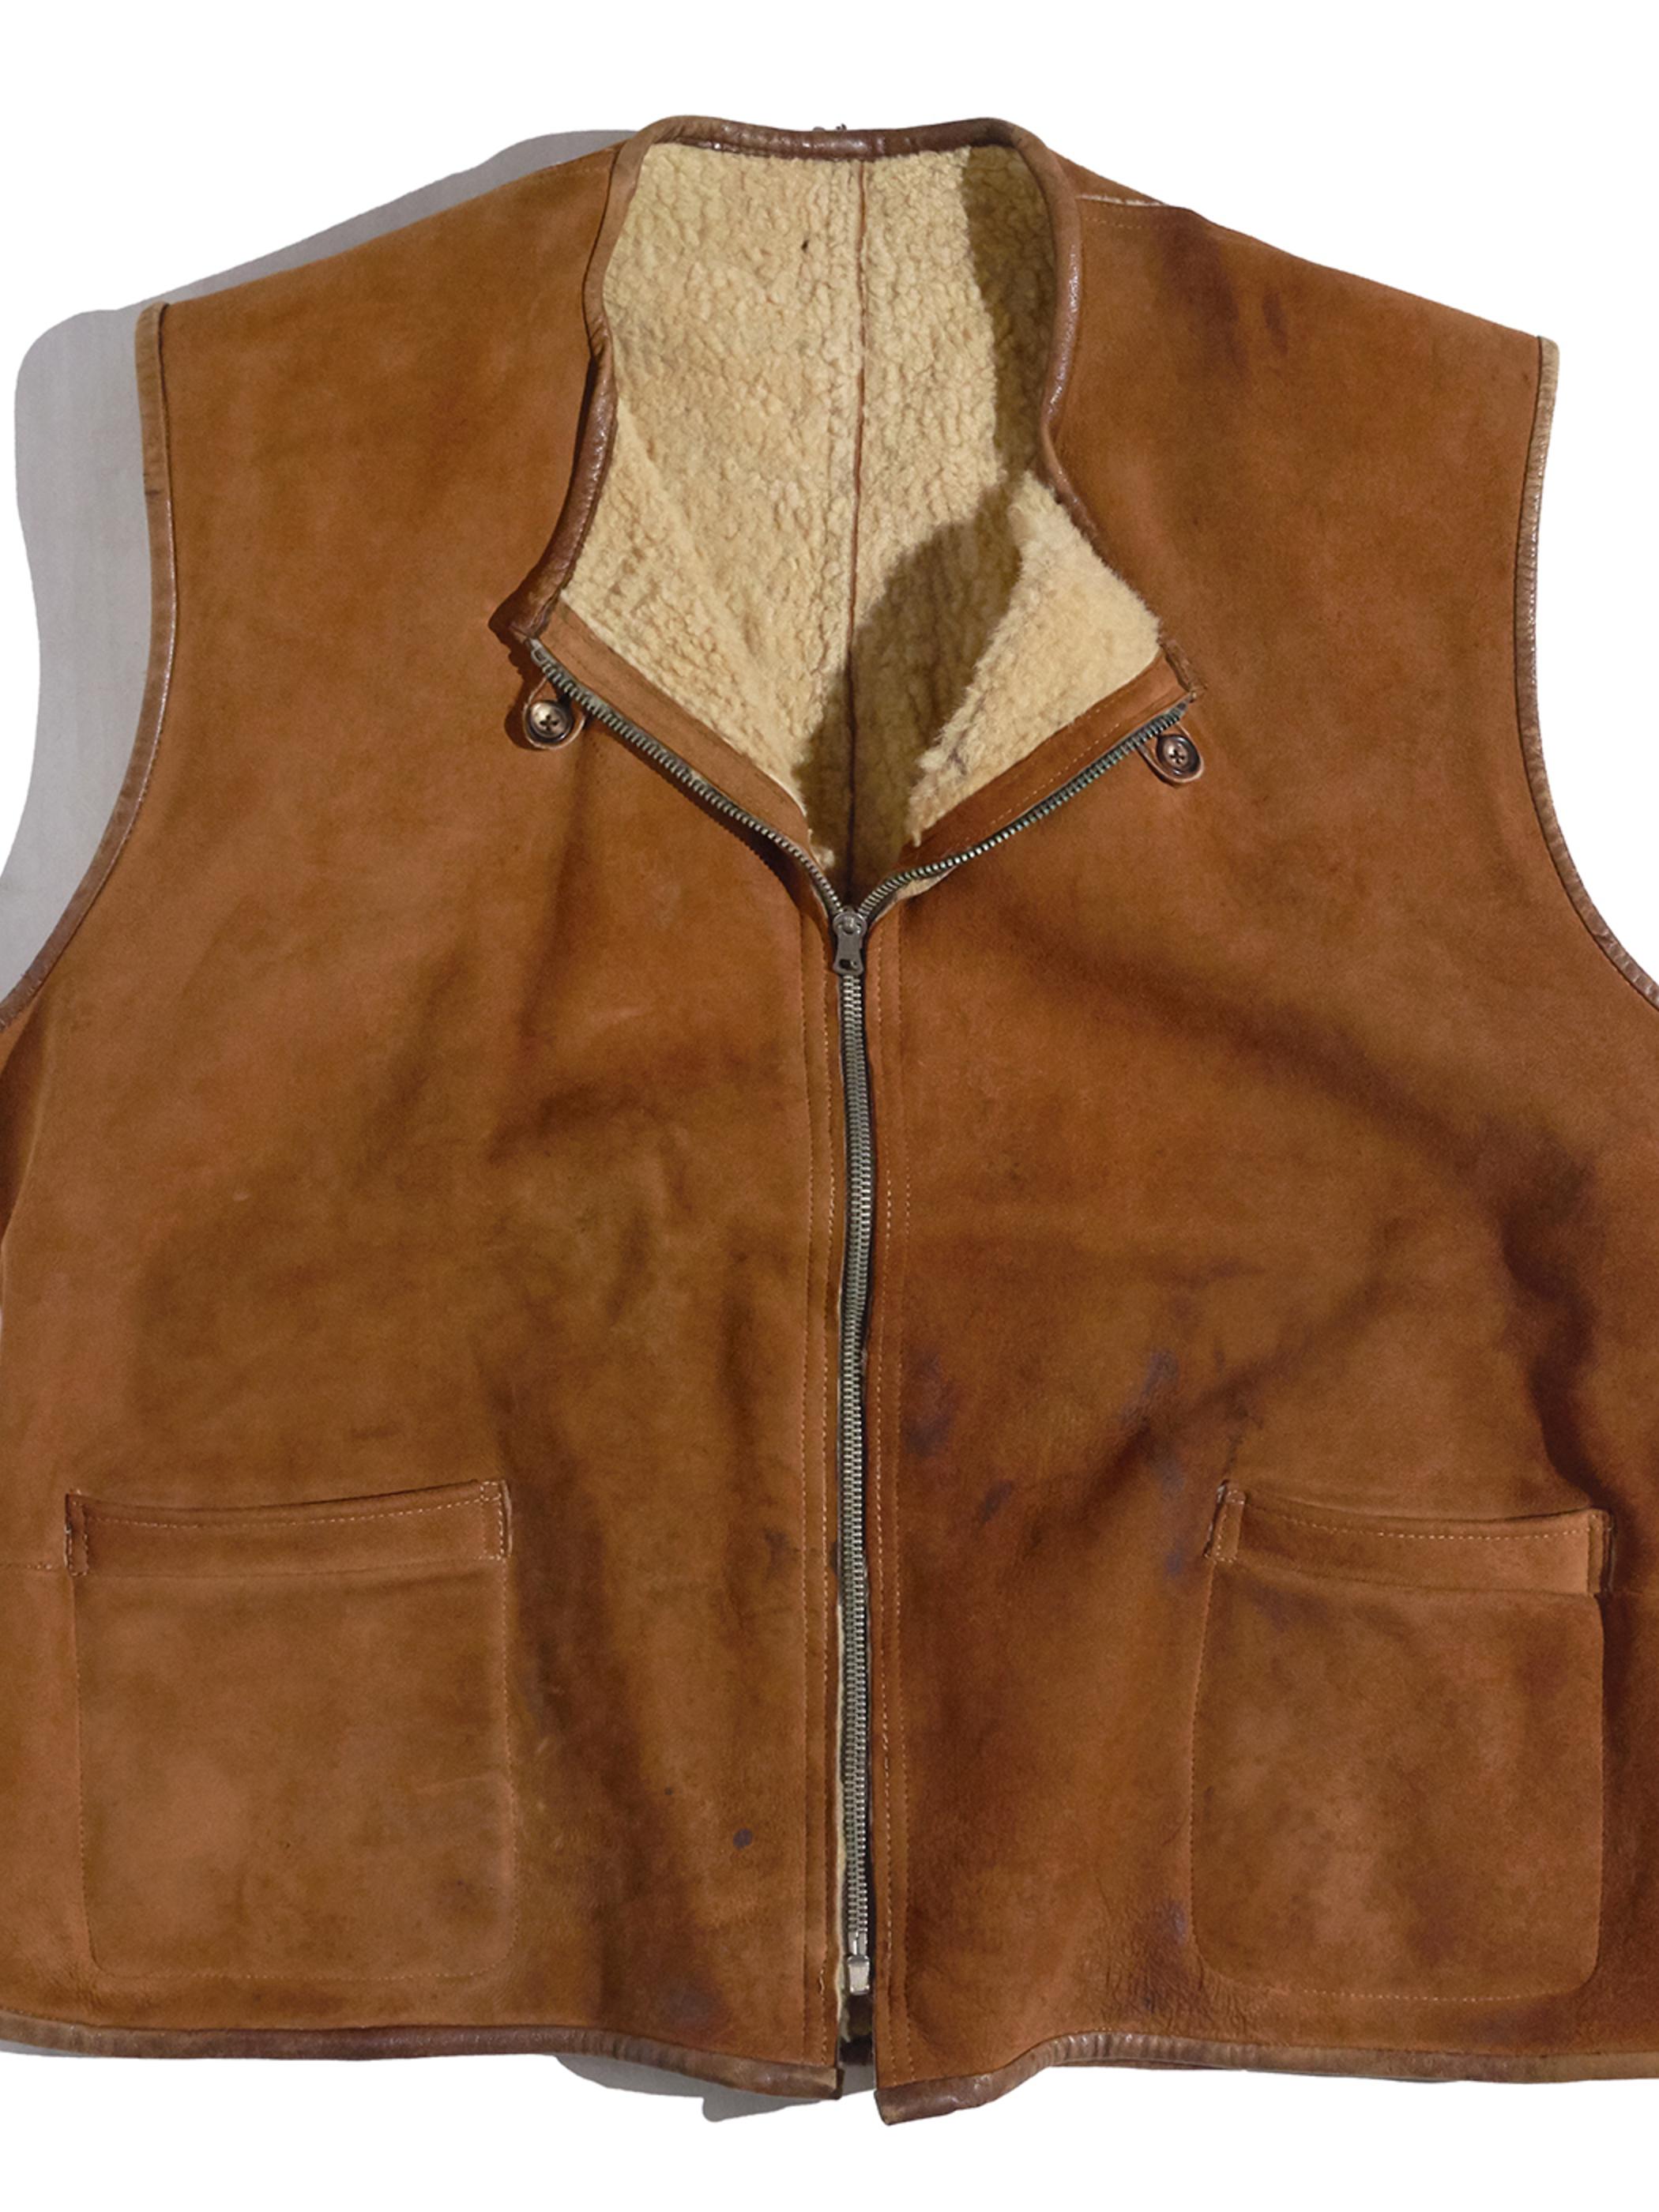 "1940s "" Abercrombie & Fitch"" mouton vest -BROWN-"